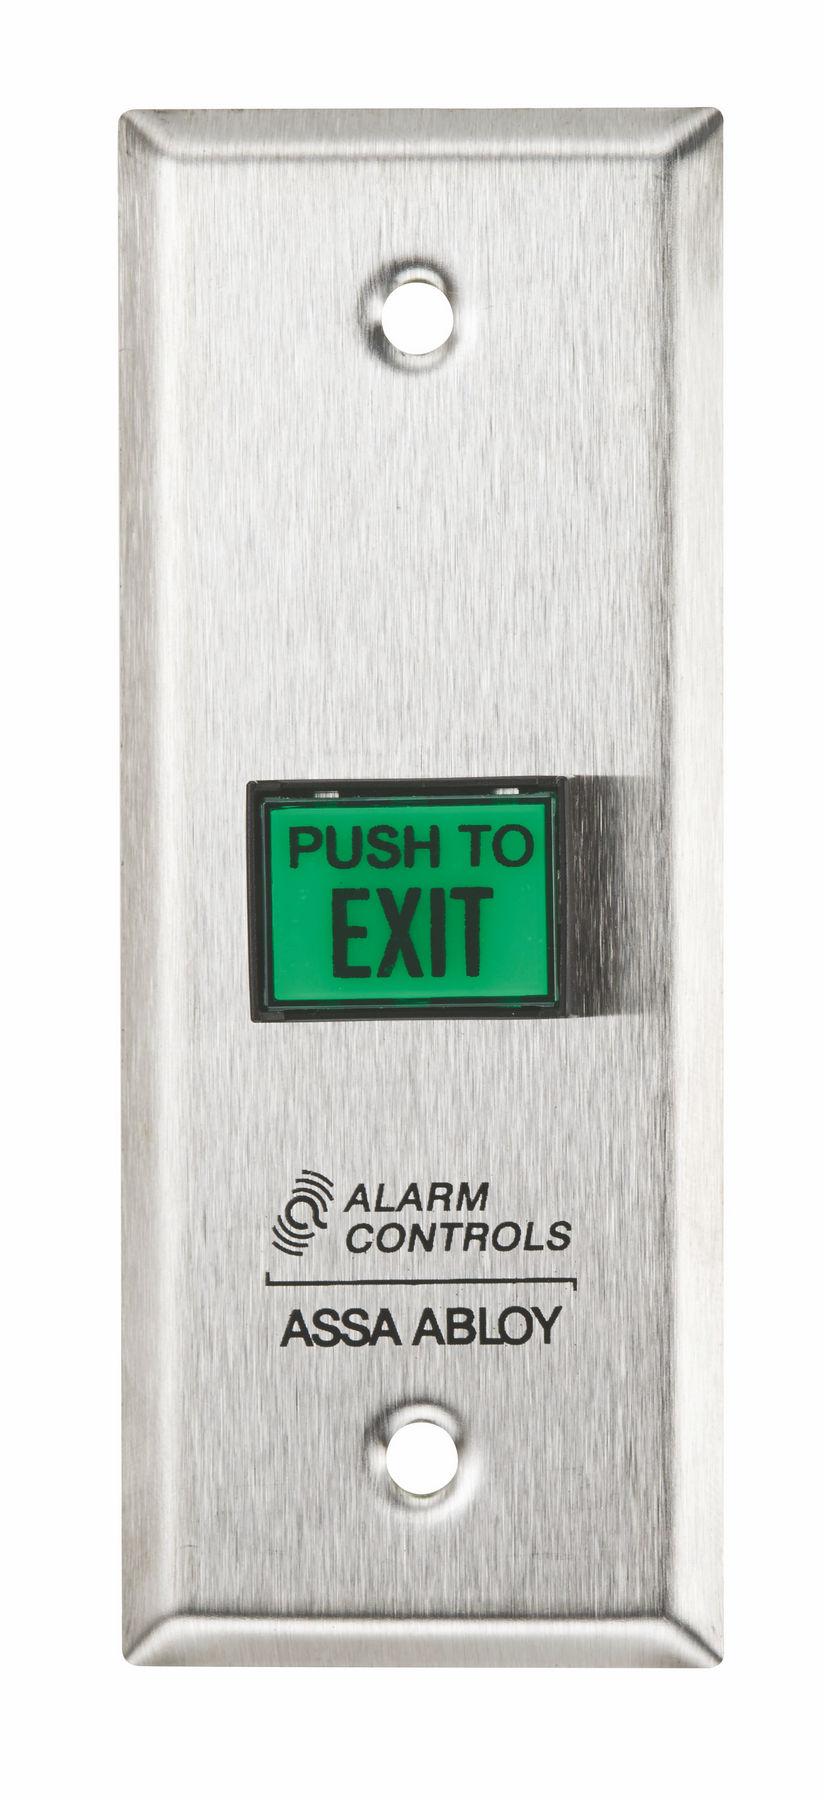 Alarm Controls Ts9 Narrow Green Square Push To Exit Button